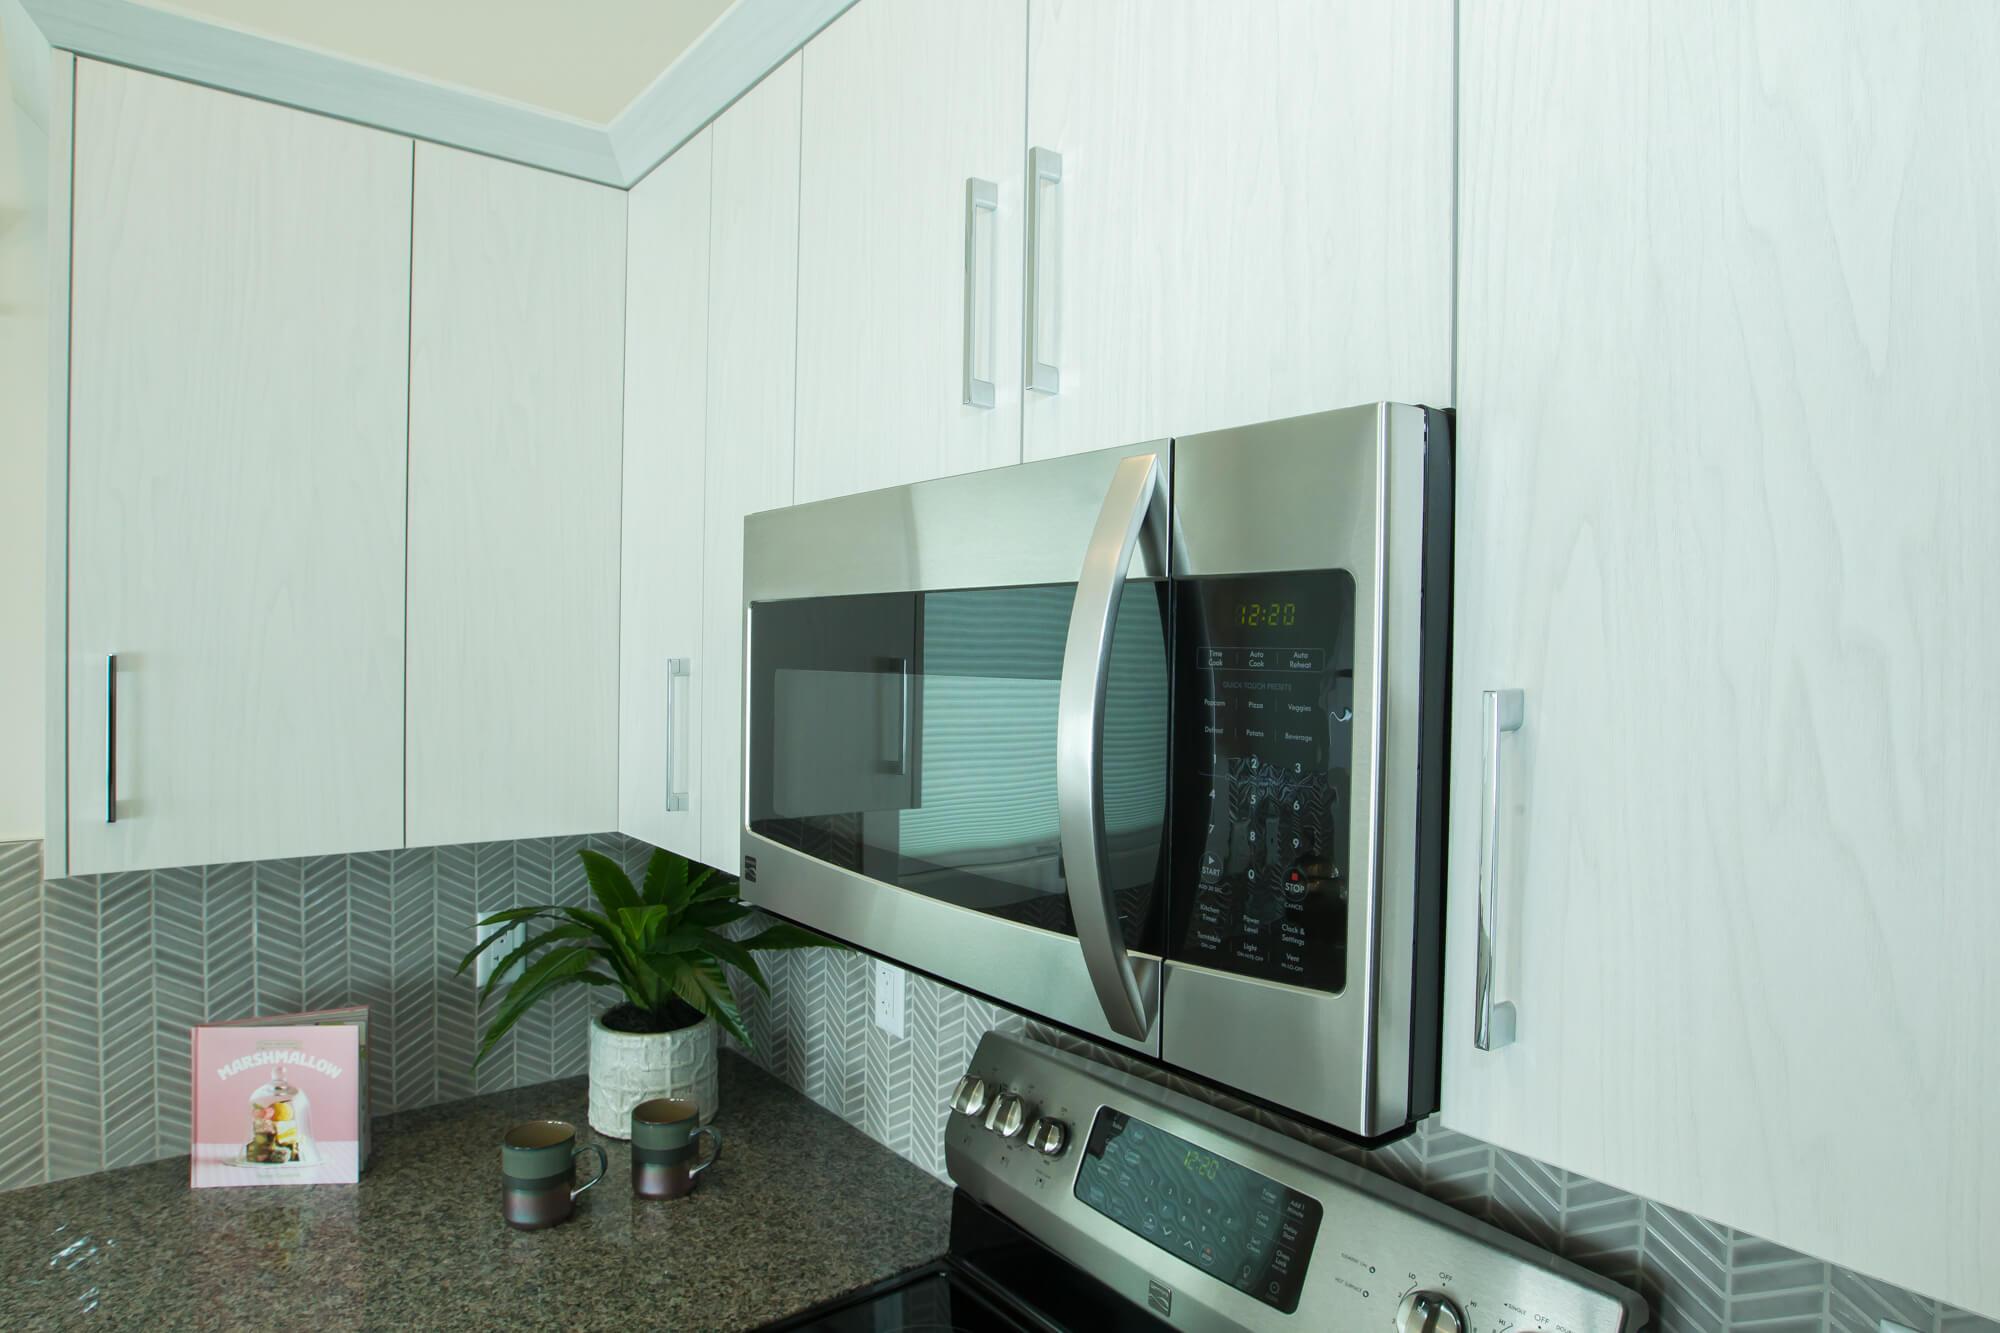 Custom Lethbridge Kitchen With Energy Star Appliances